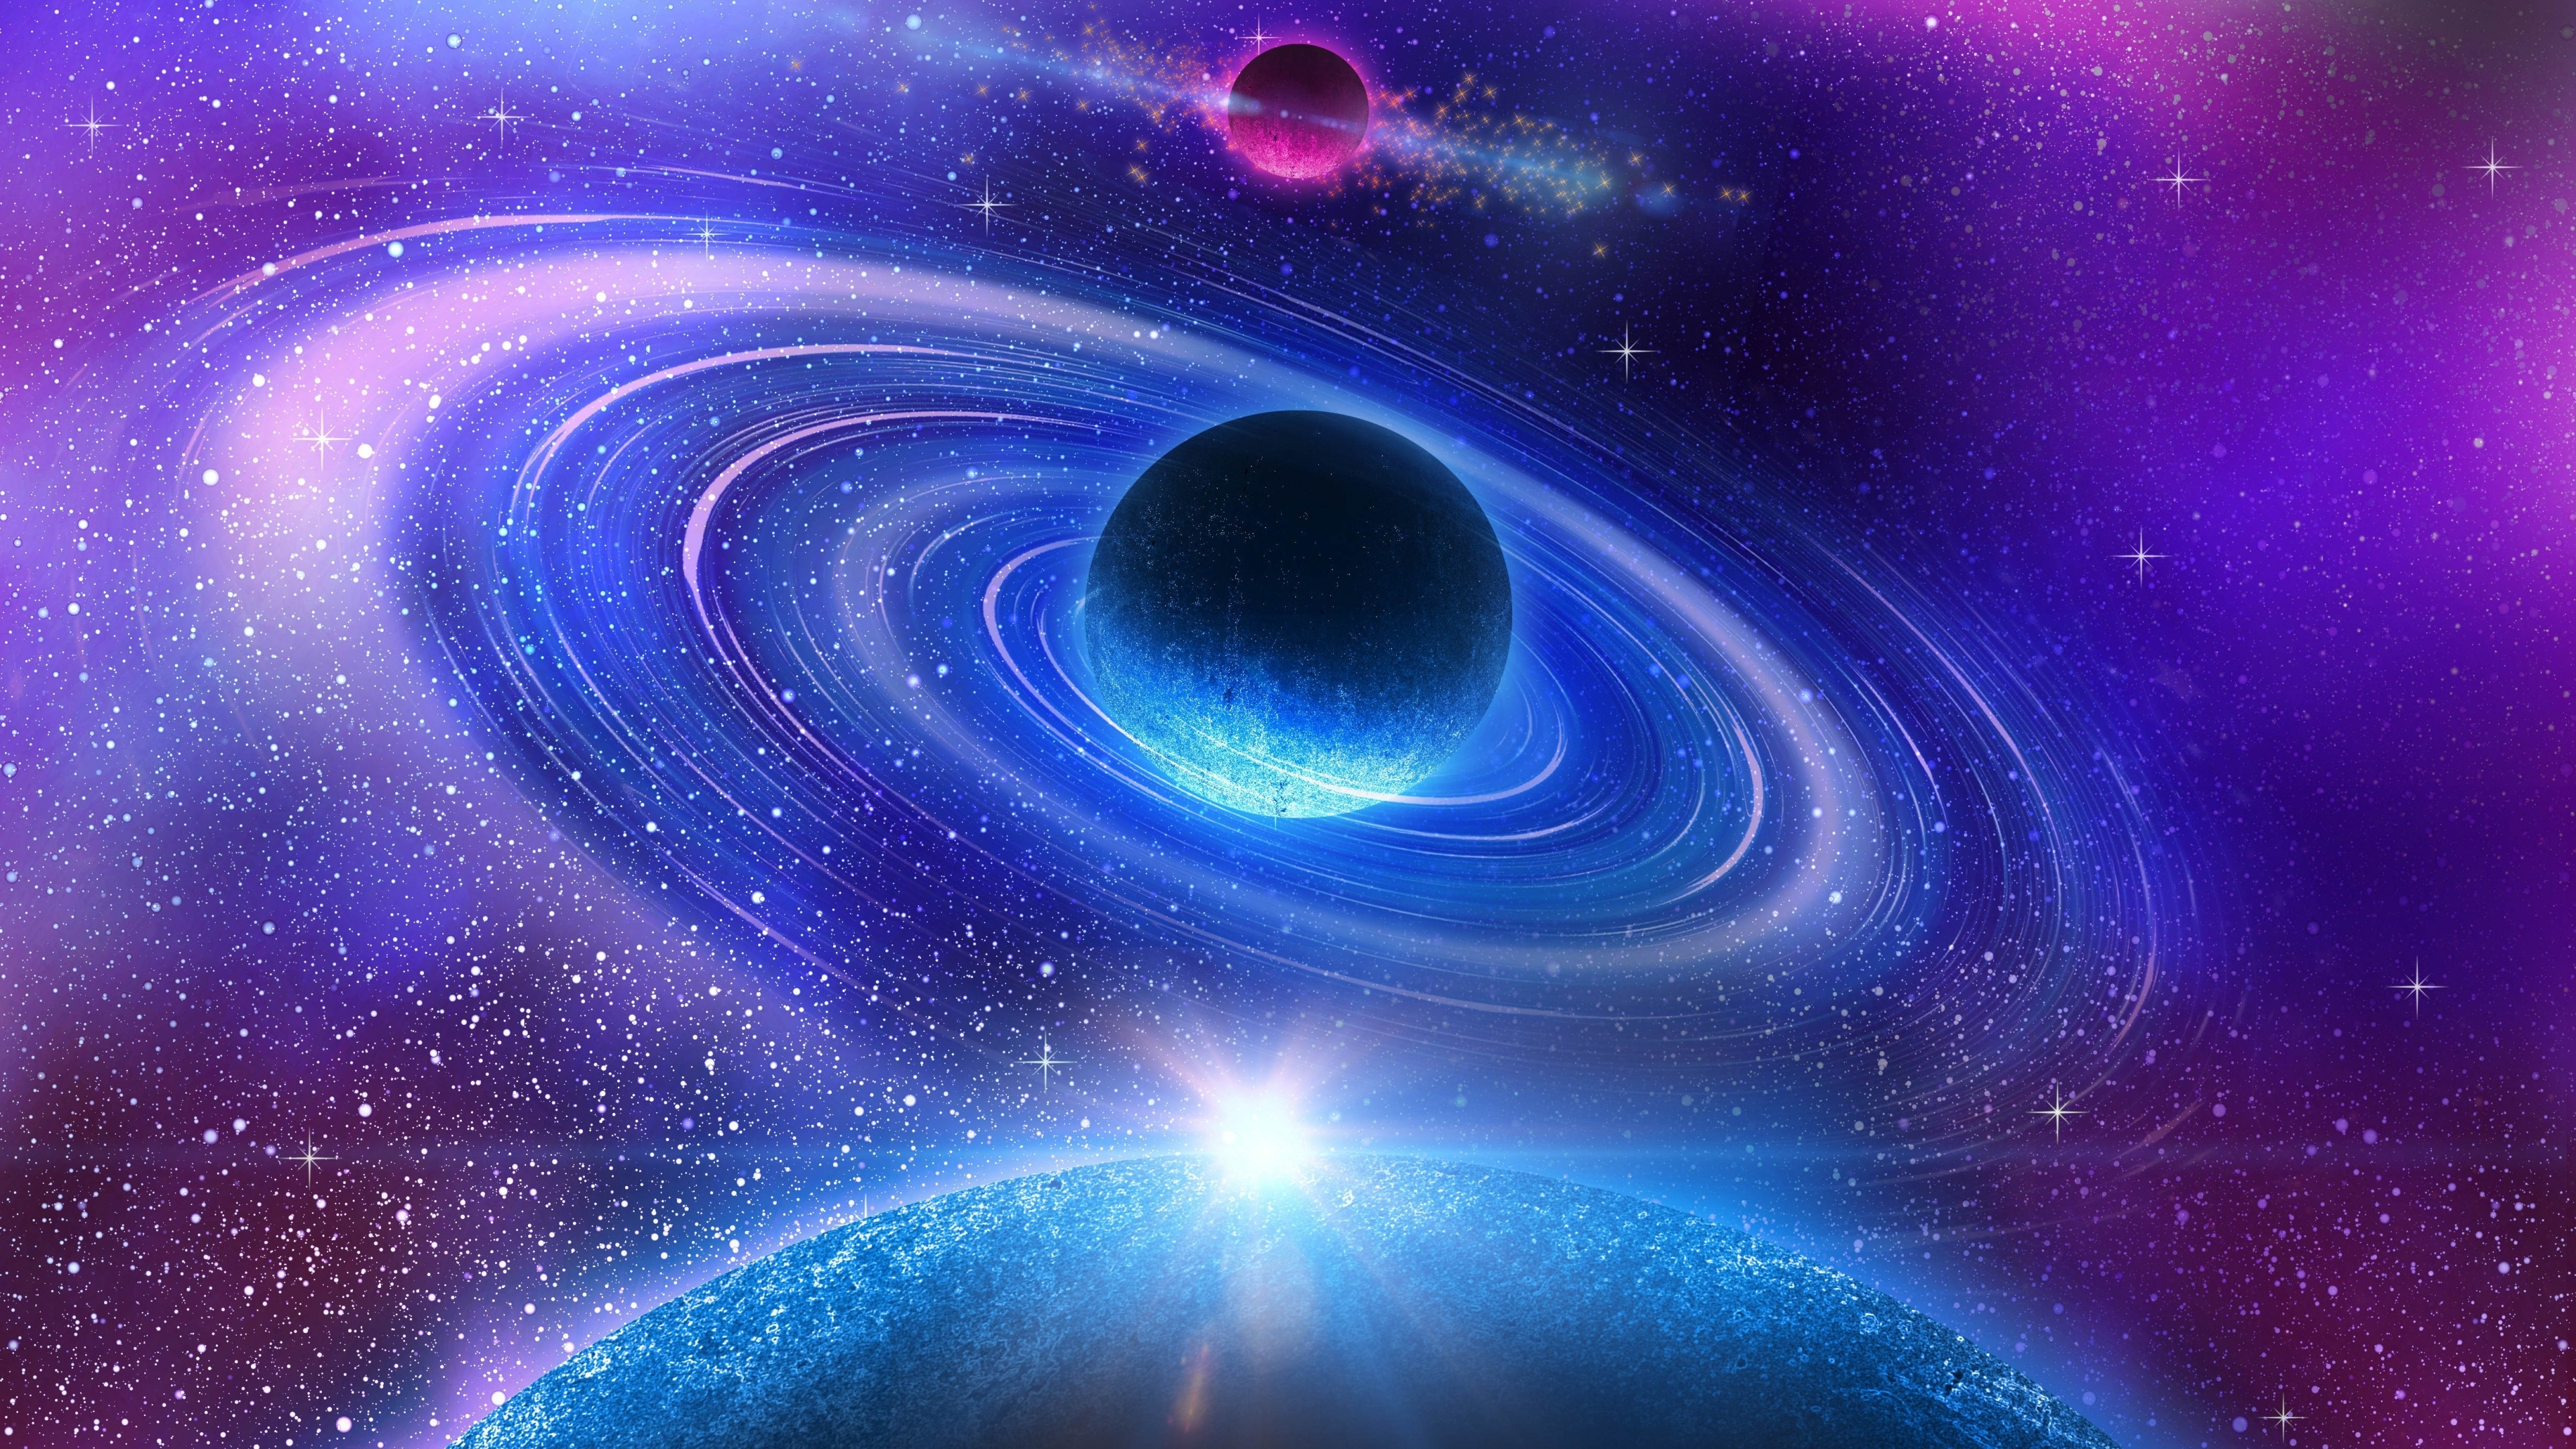 Wallpaper Beautiful Universe Blue Planet 3840x2160 UHD 4K Picture